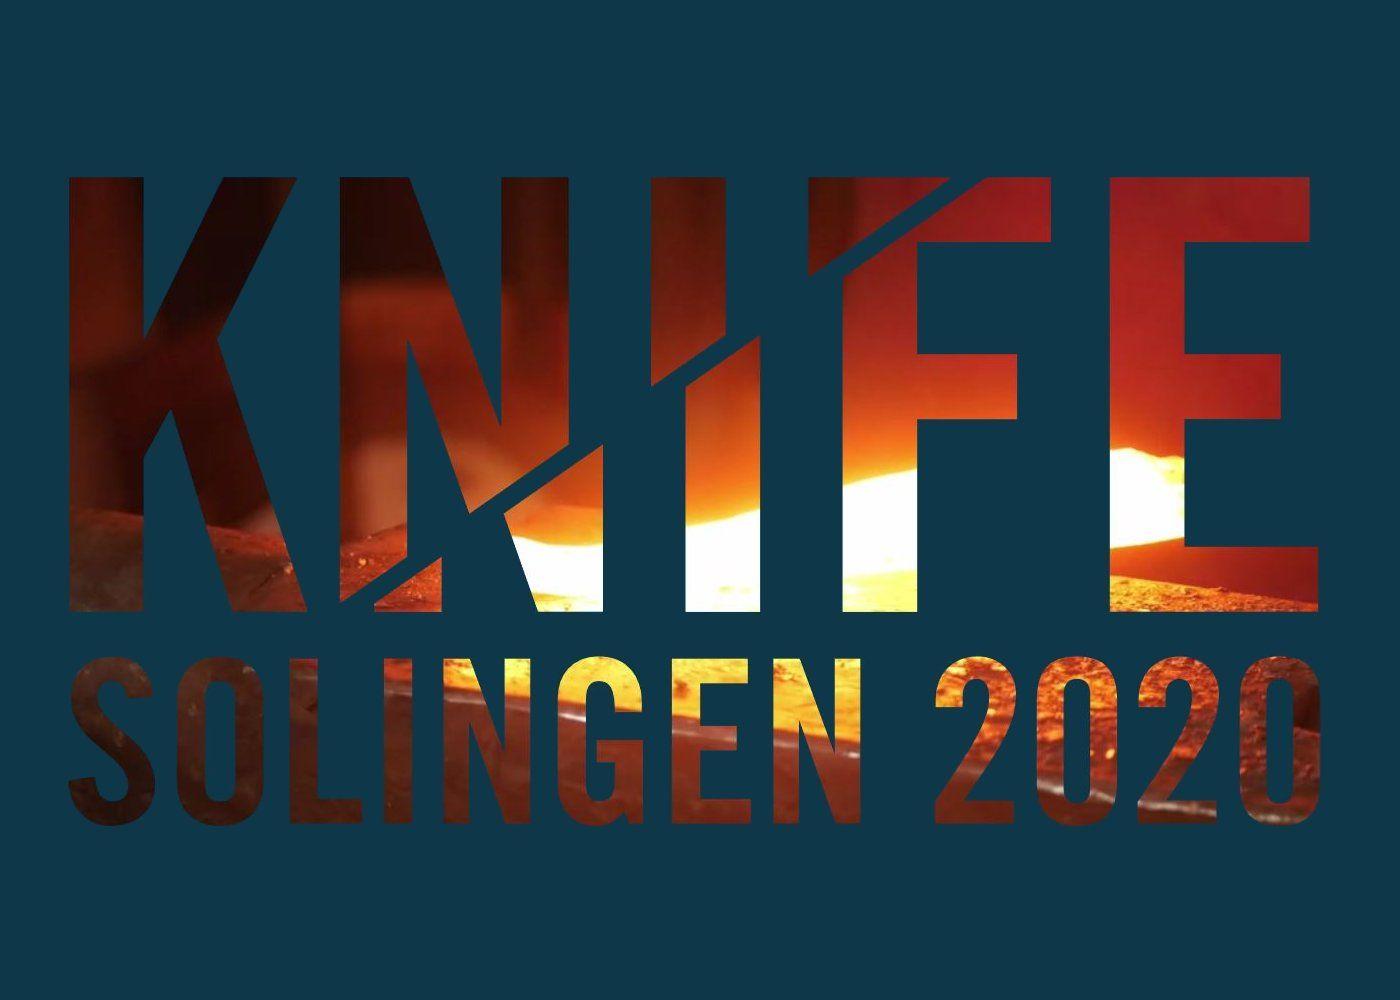 Knife 2020 in Solingen